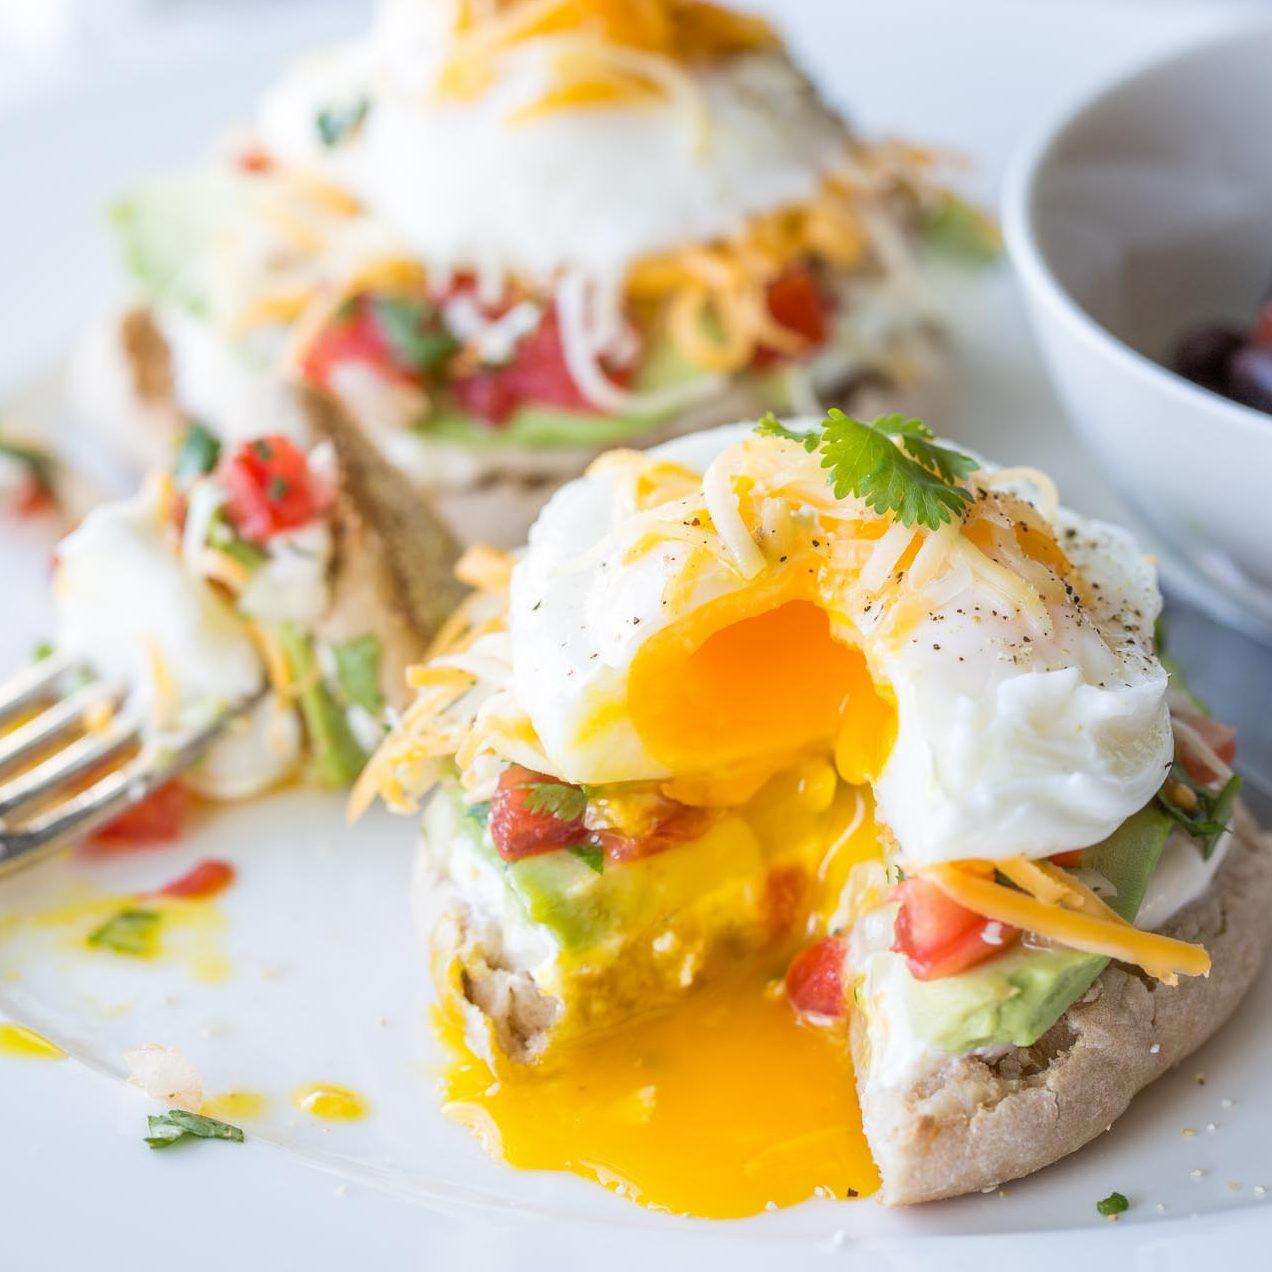 Heart Healthy Breakfast Recipes  Healthy Breakfast Ideas to Start Your Day f Right